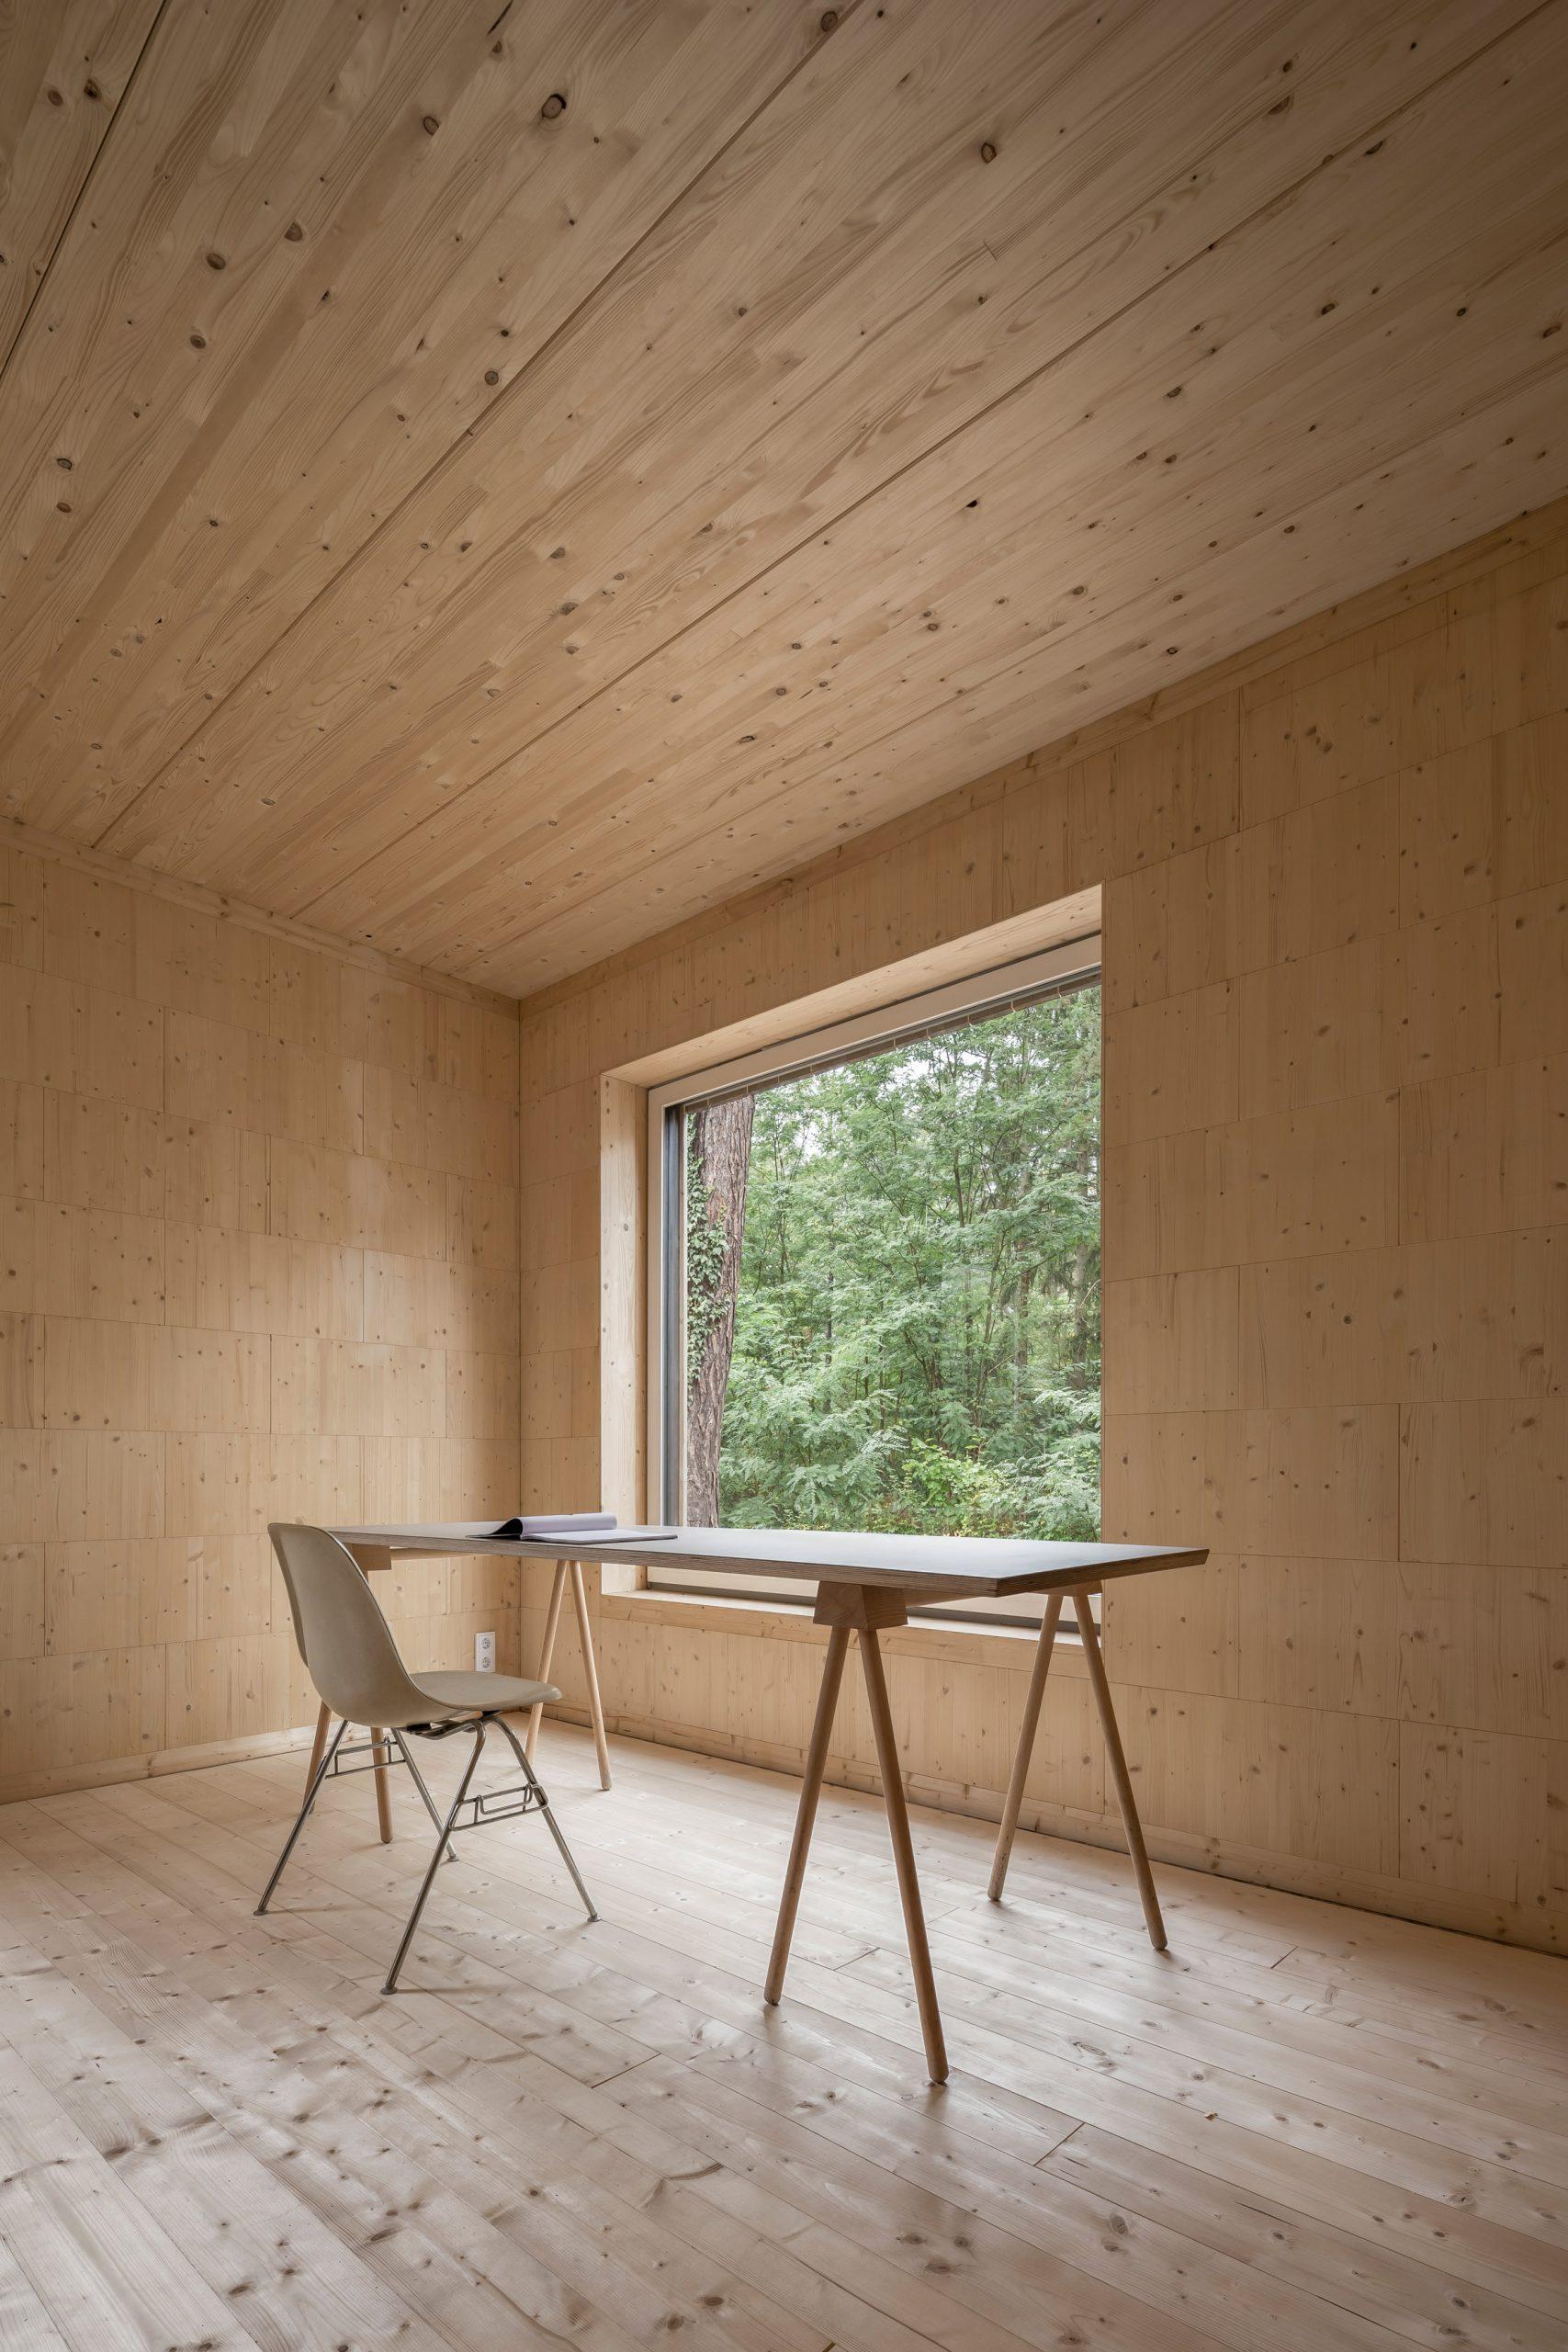 Haus Koeris timber house in Klein Köris, Germany, by Zeller & Moye